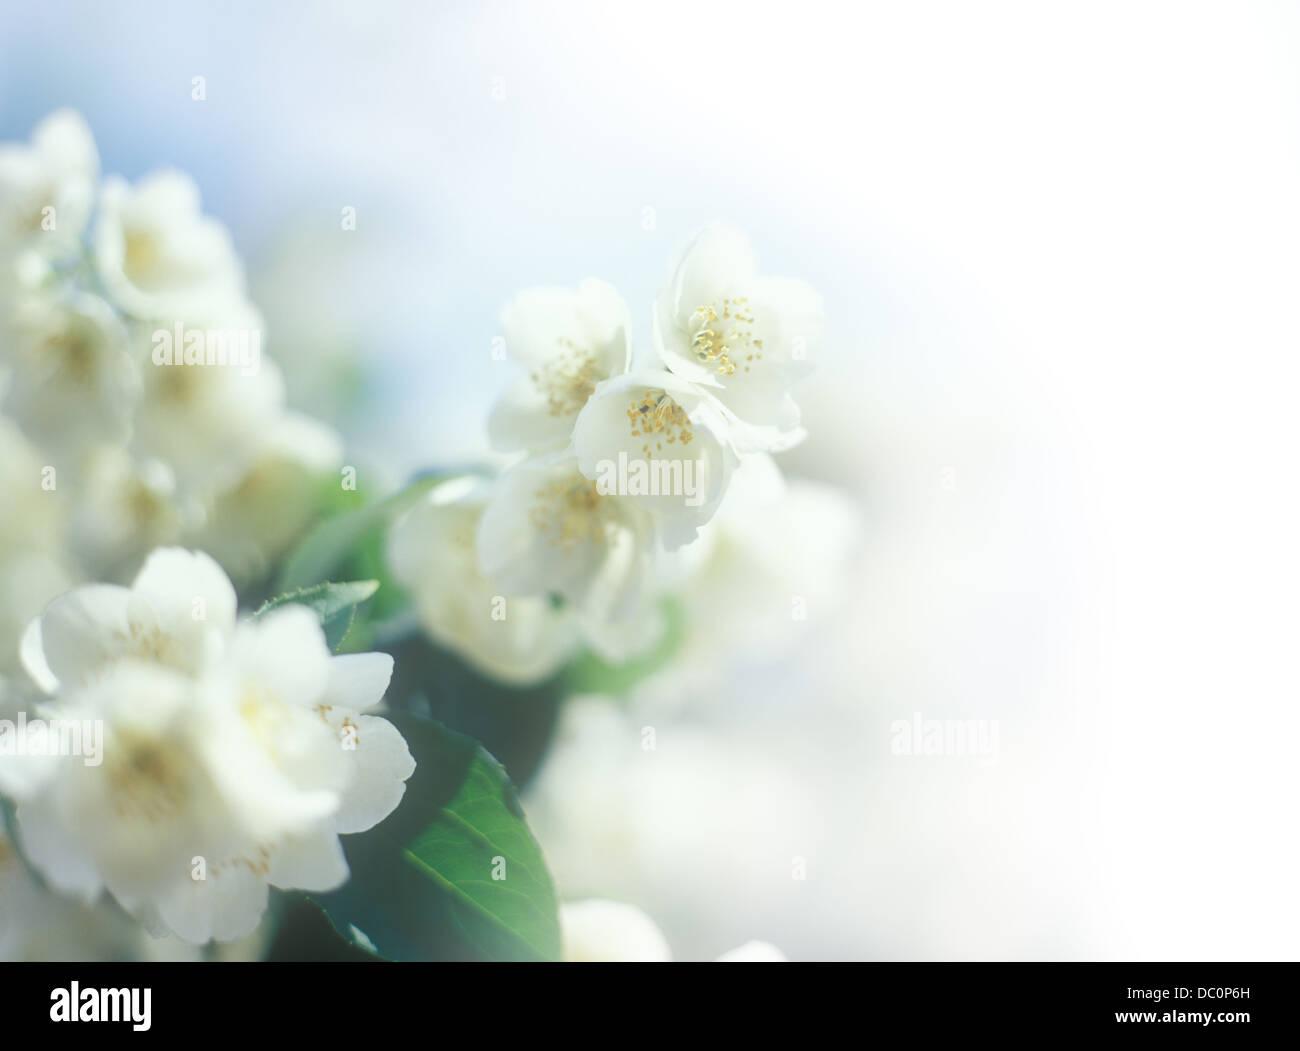 Jasmine border. - Stock Image